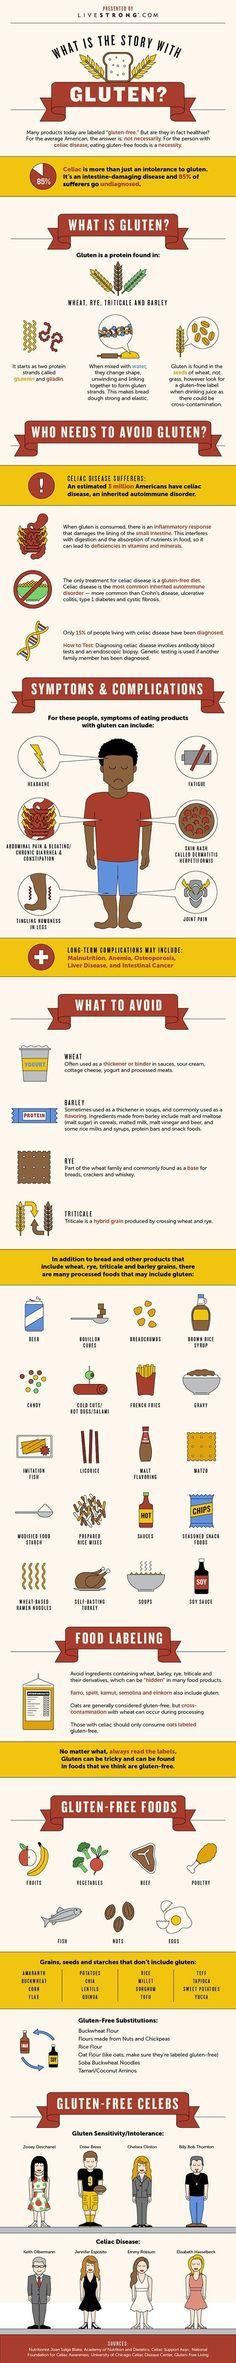 Everything you need to know about gluten. #gluten #glutenfree